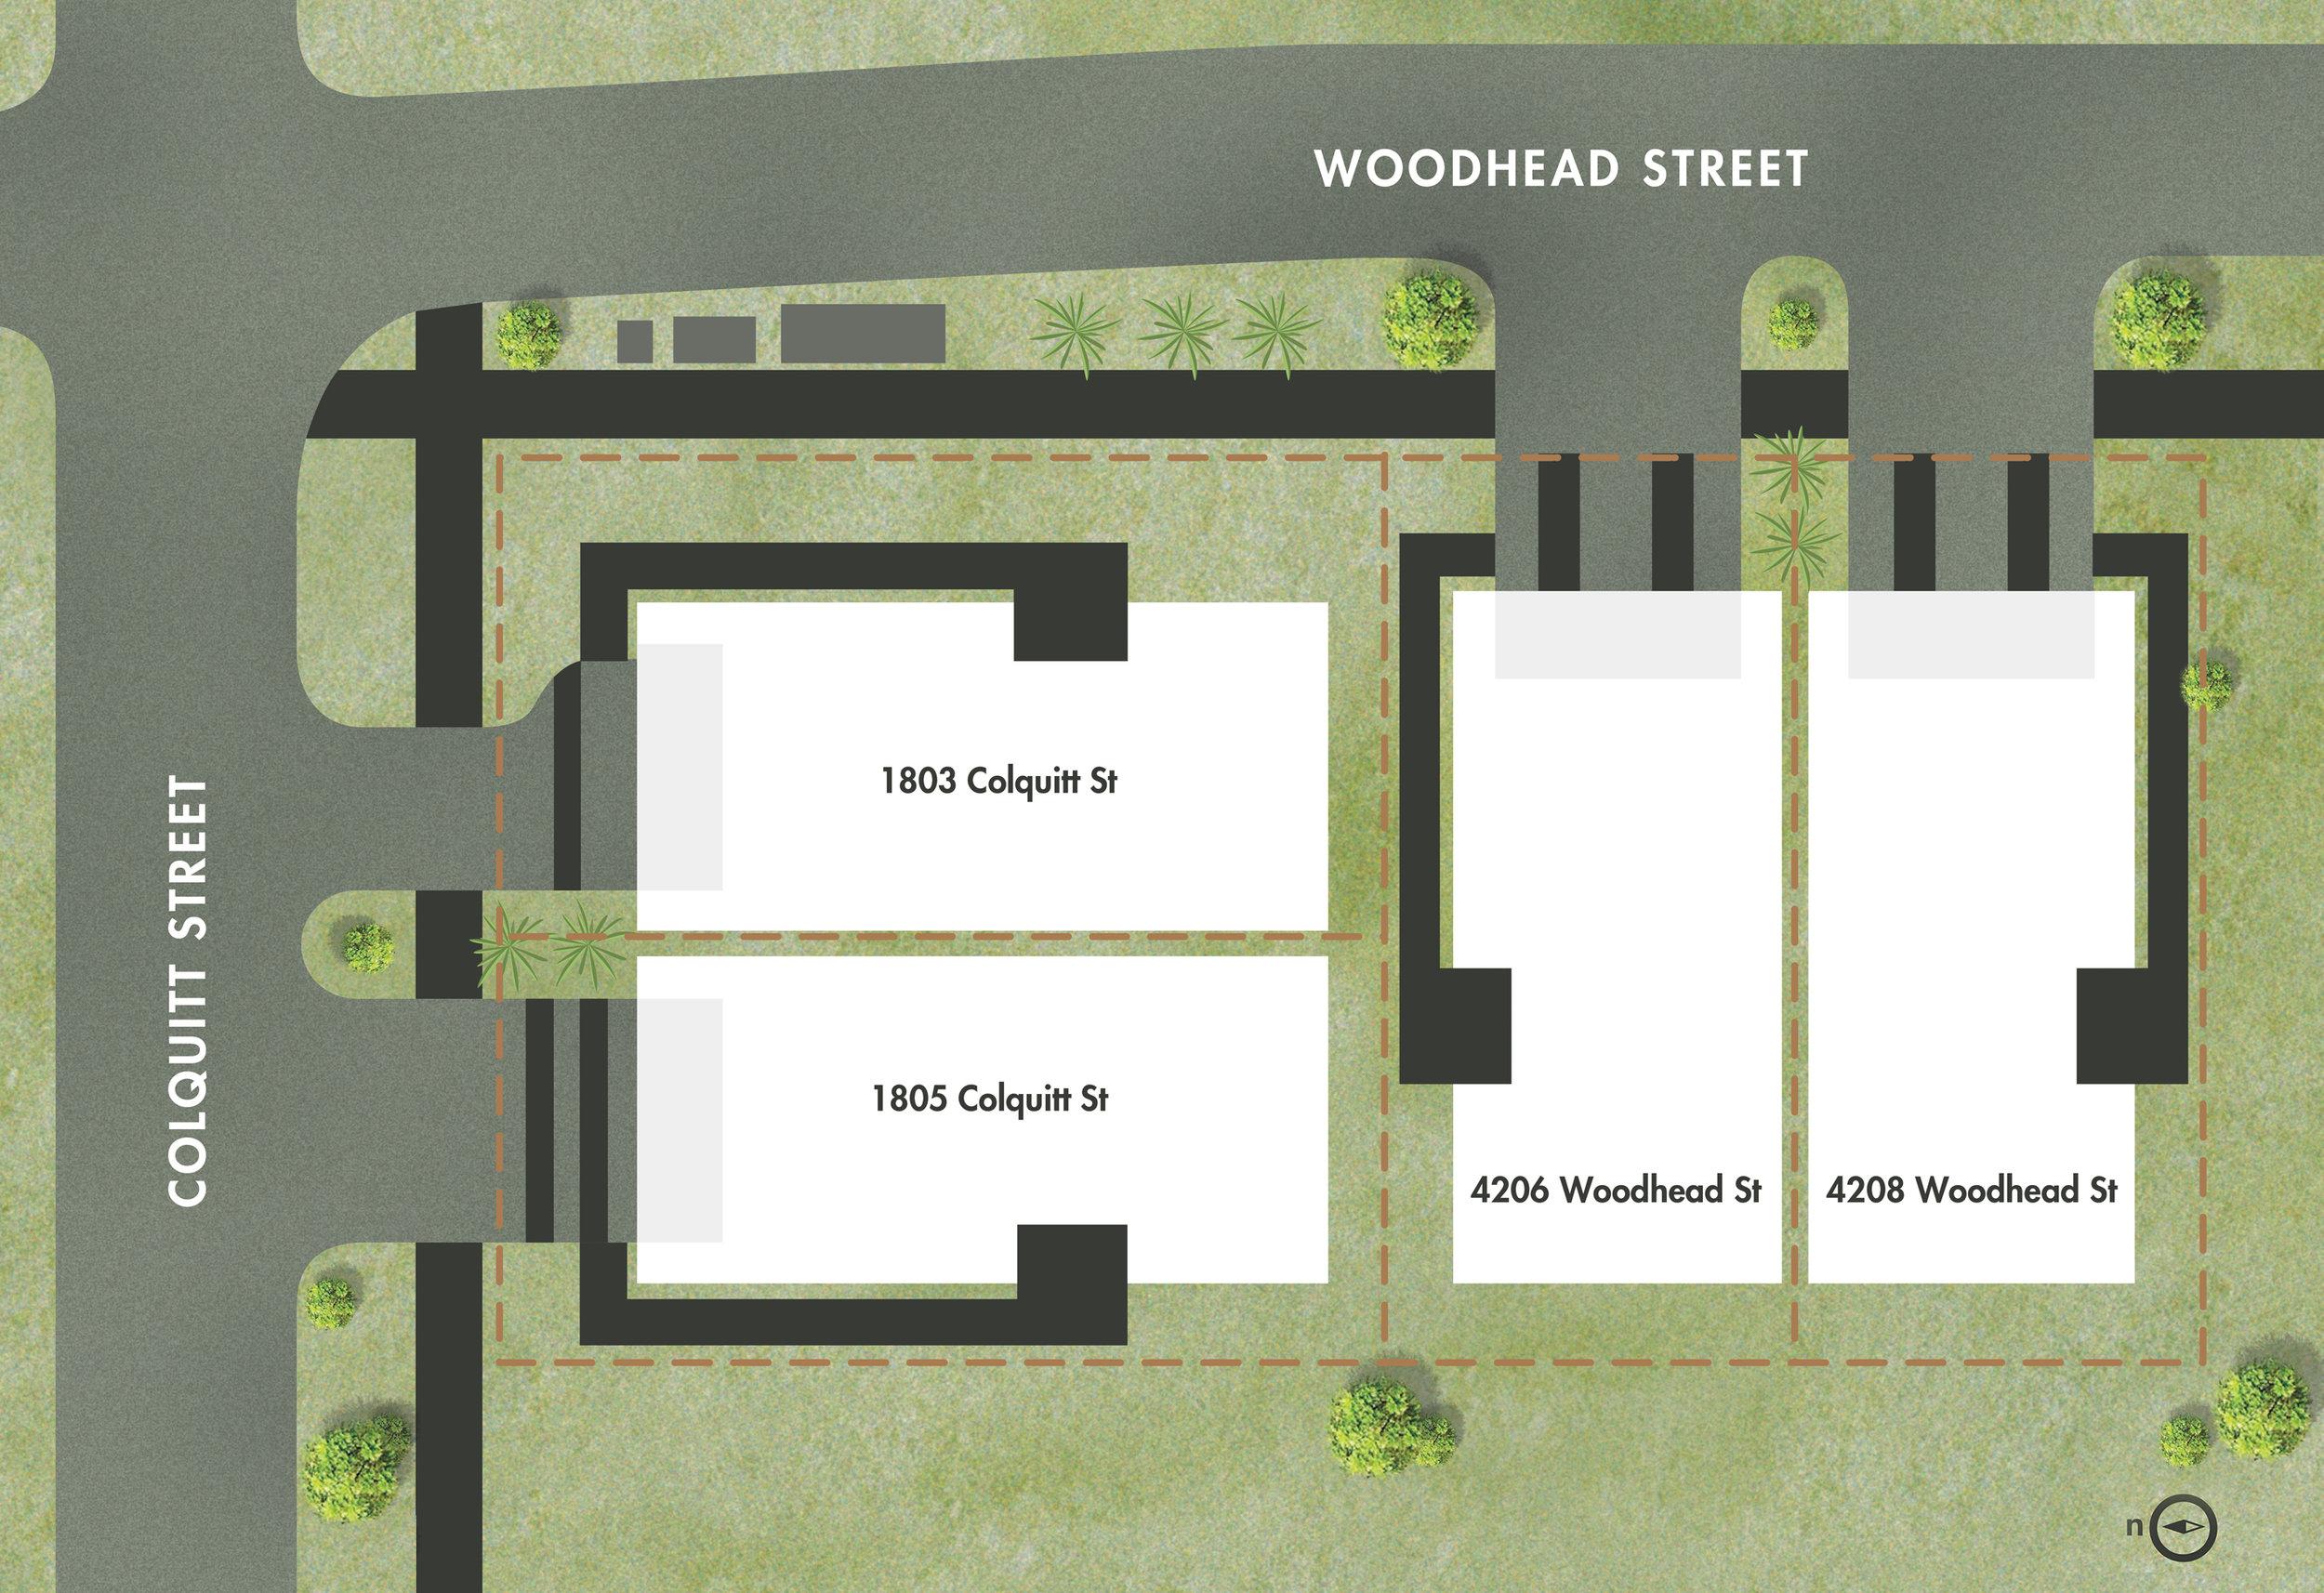 WoodheadEstates_Stpn_LBD.jpg